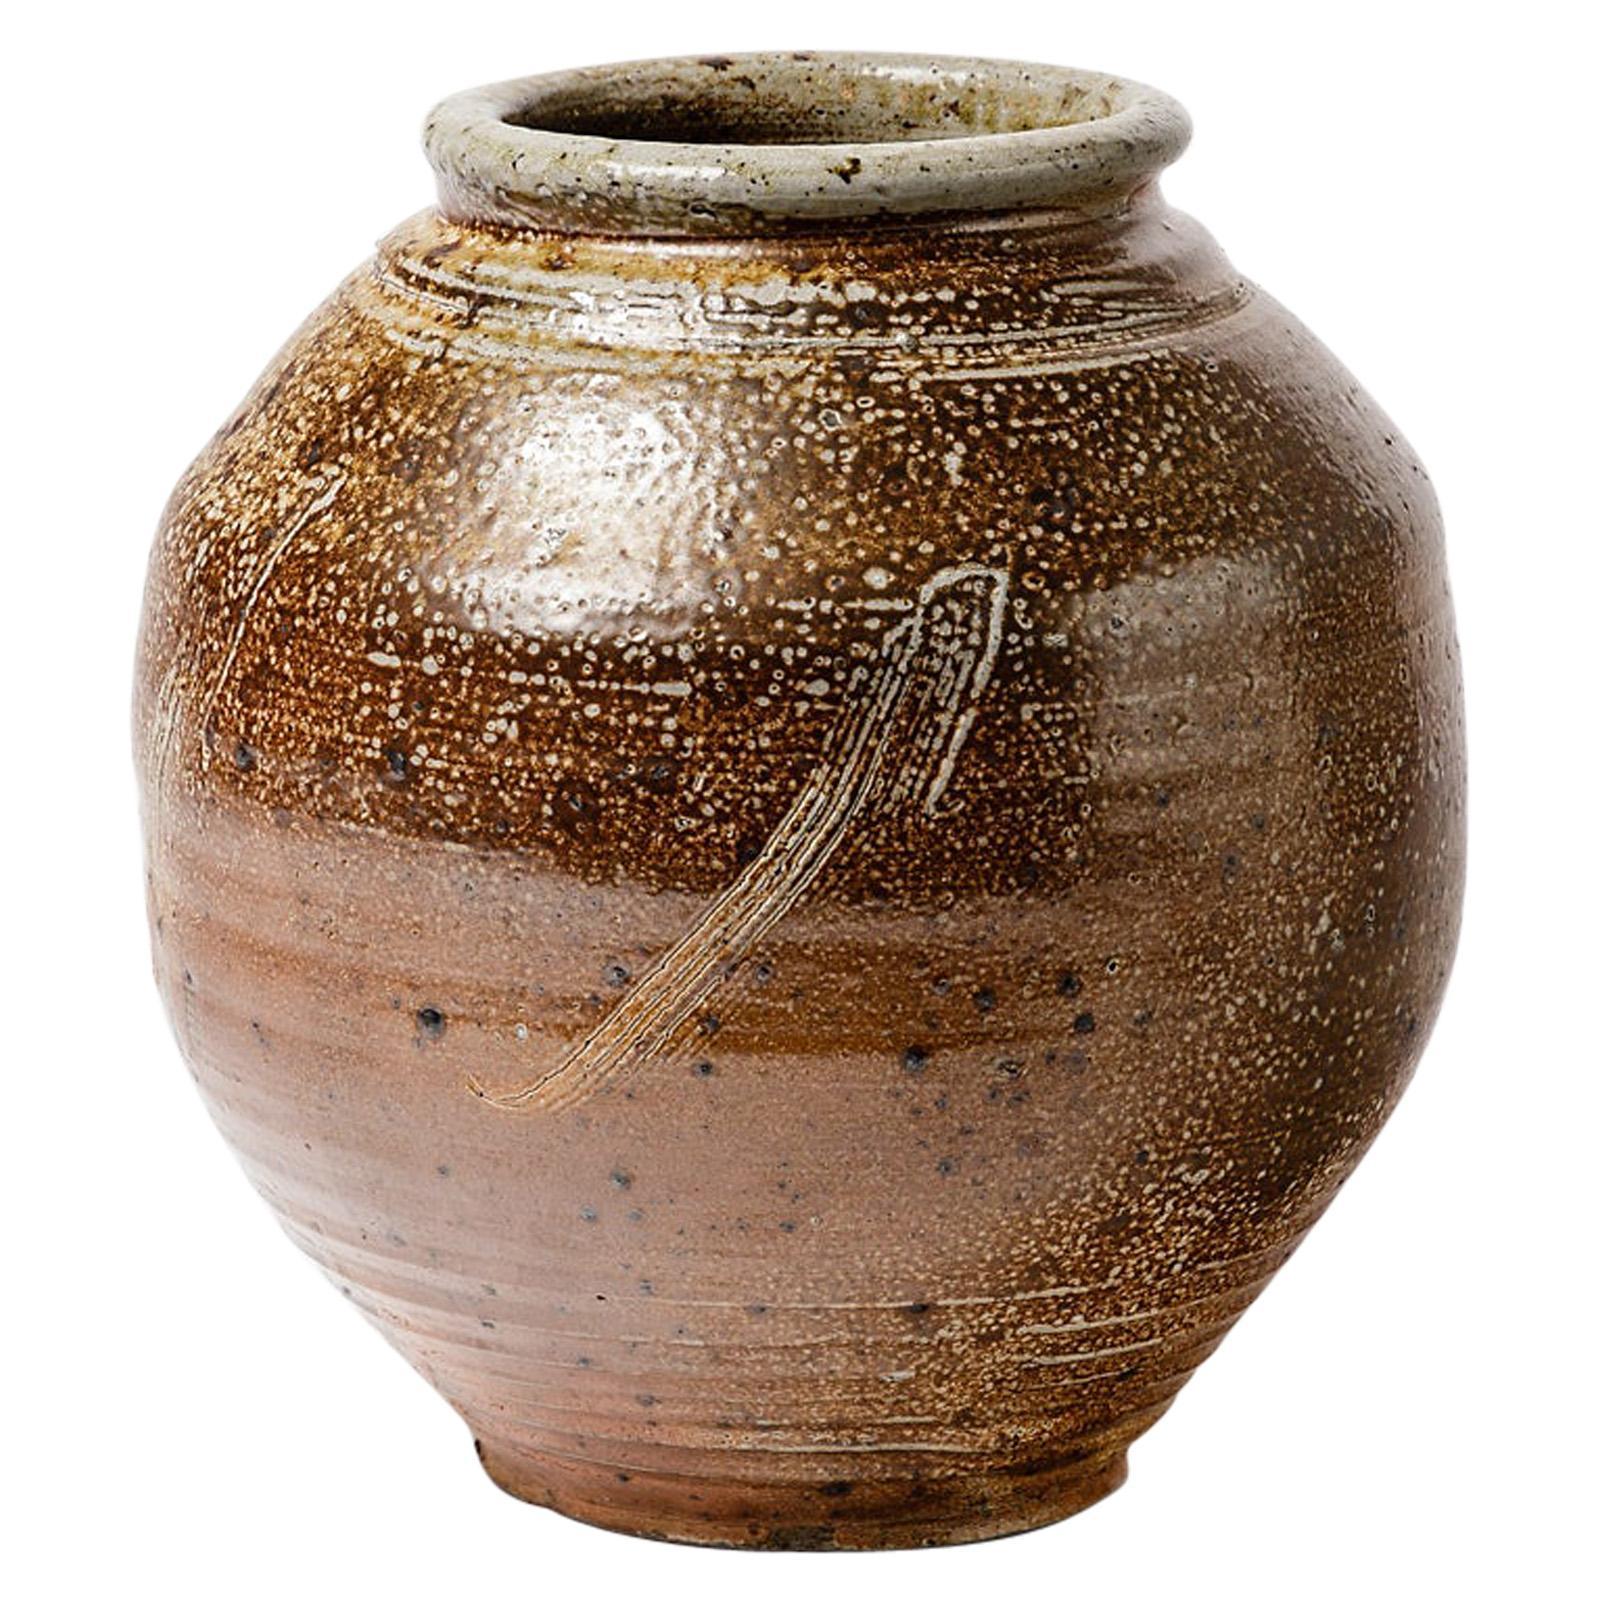 20th Century Midcentury Stoneware Ceramic Vase with Abstract Decoration